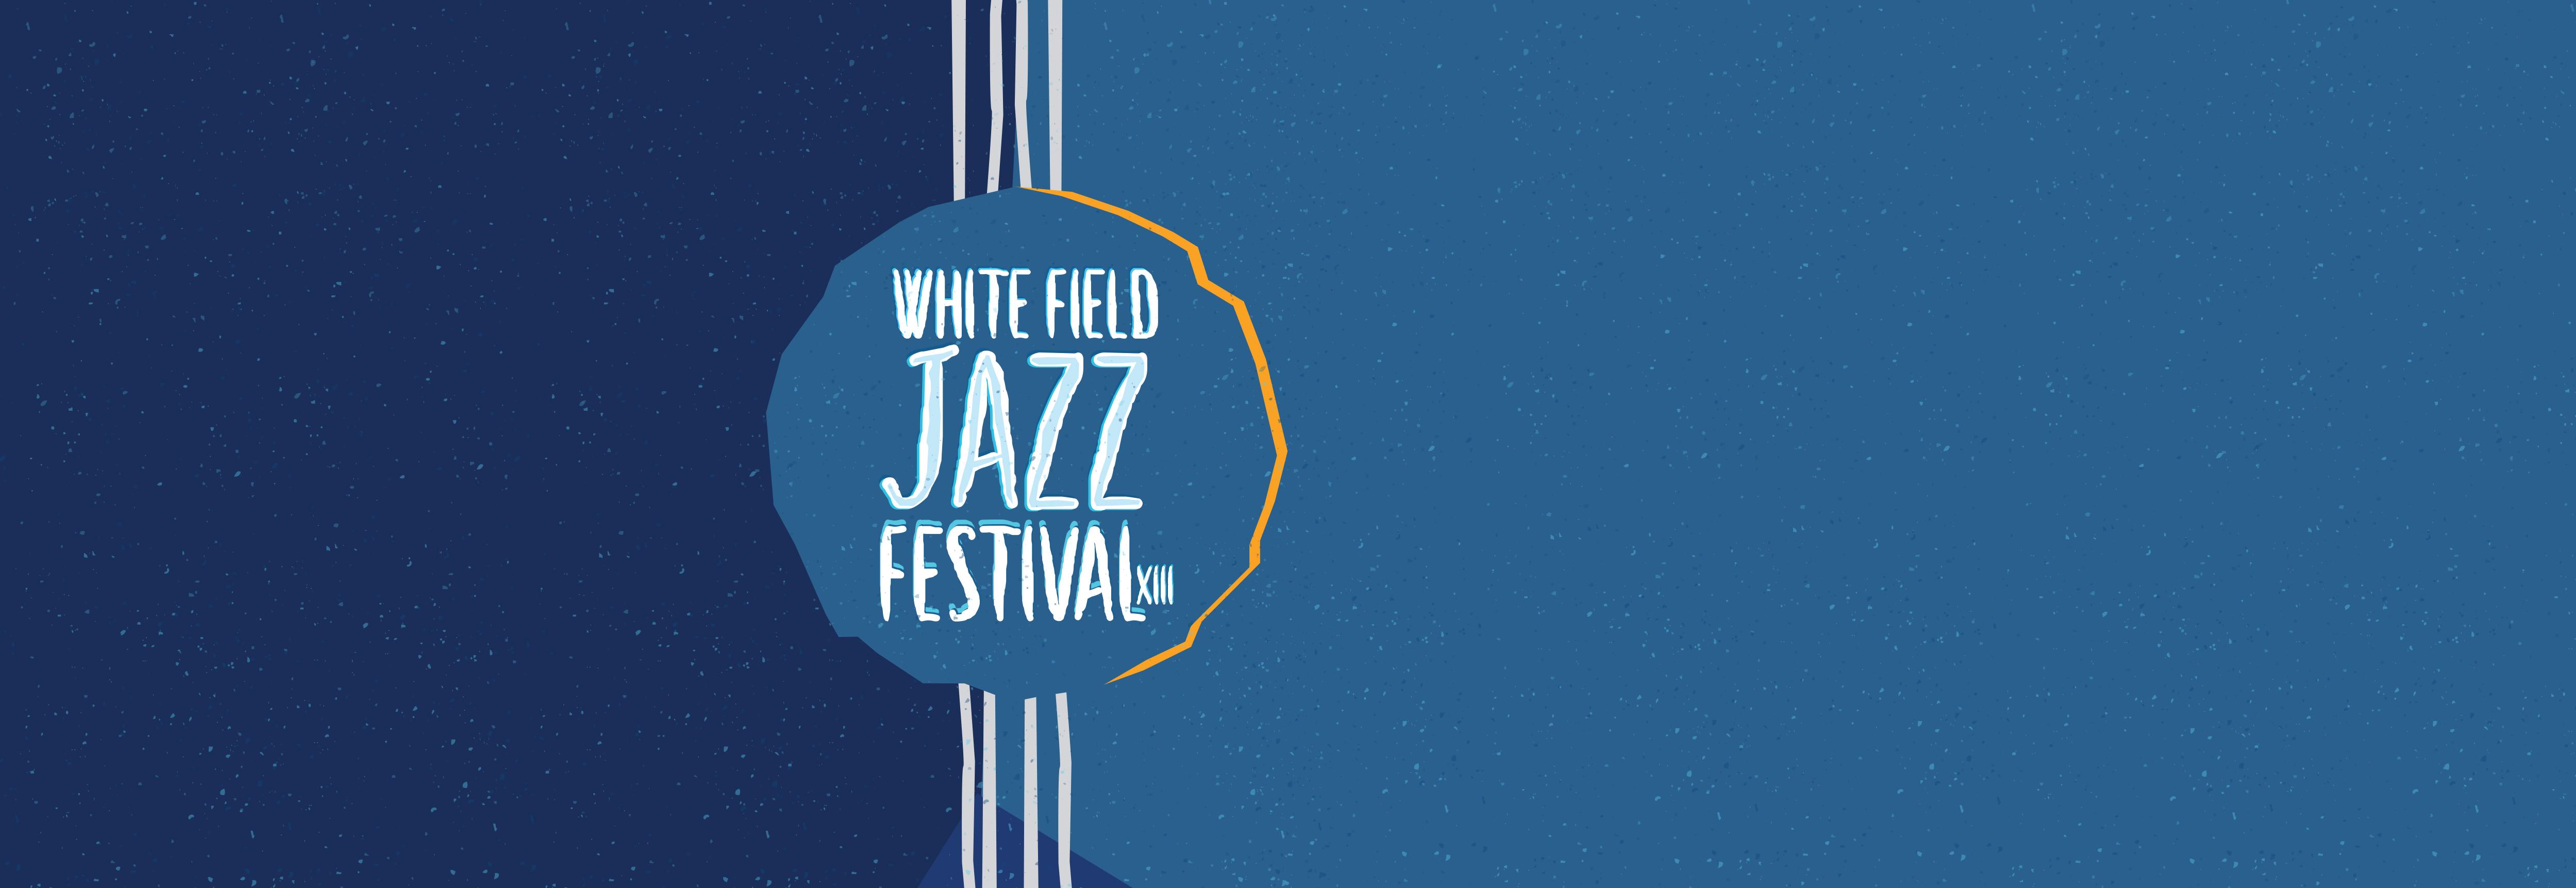 Atomsko sklonište na 13. White Field Jazz Fesdtivalu u Bijelom Polju